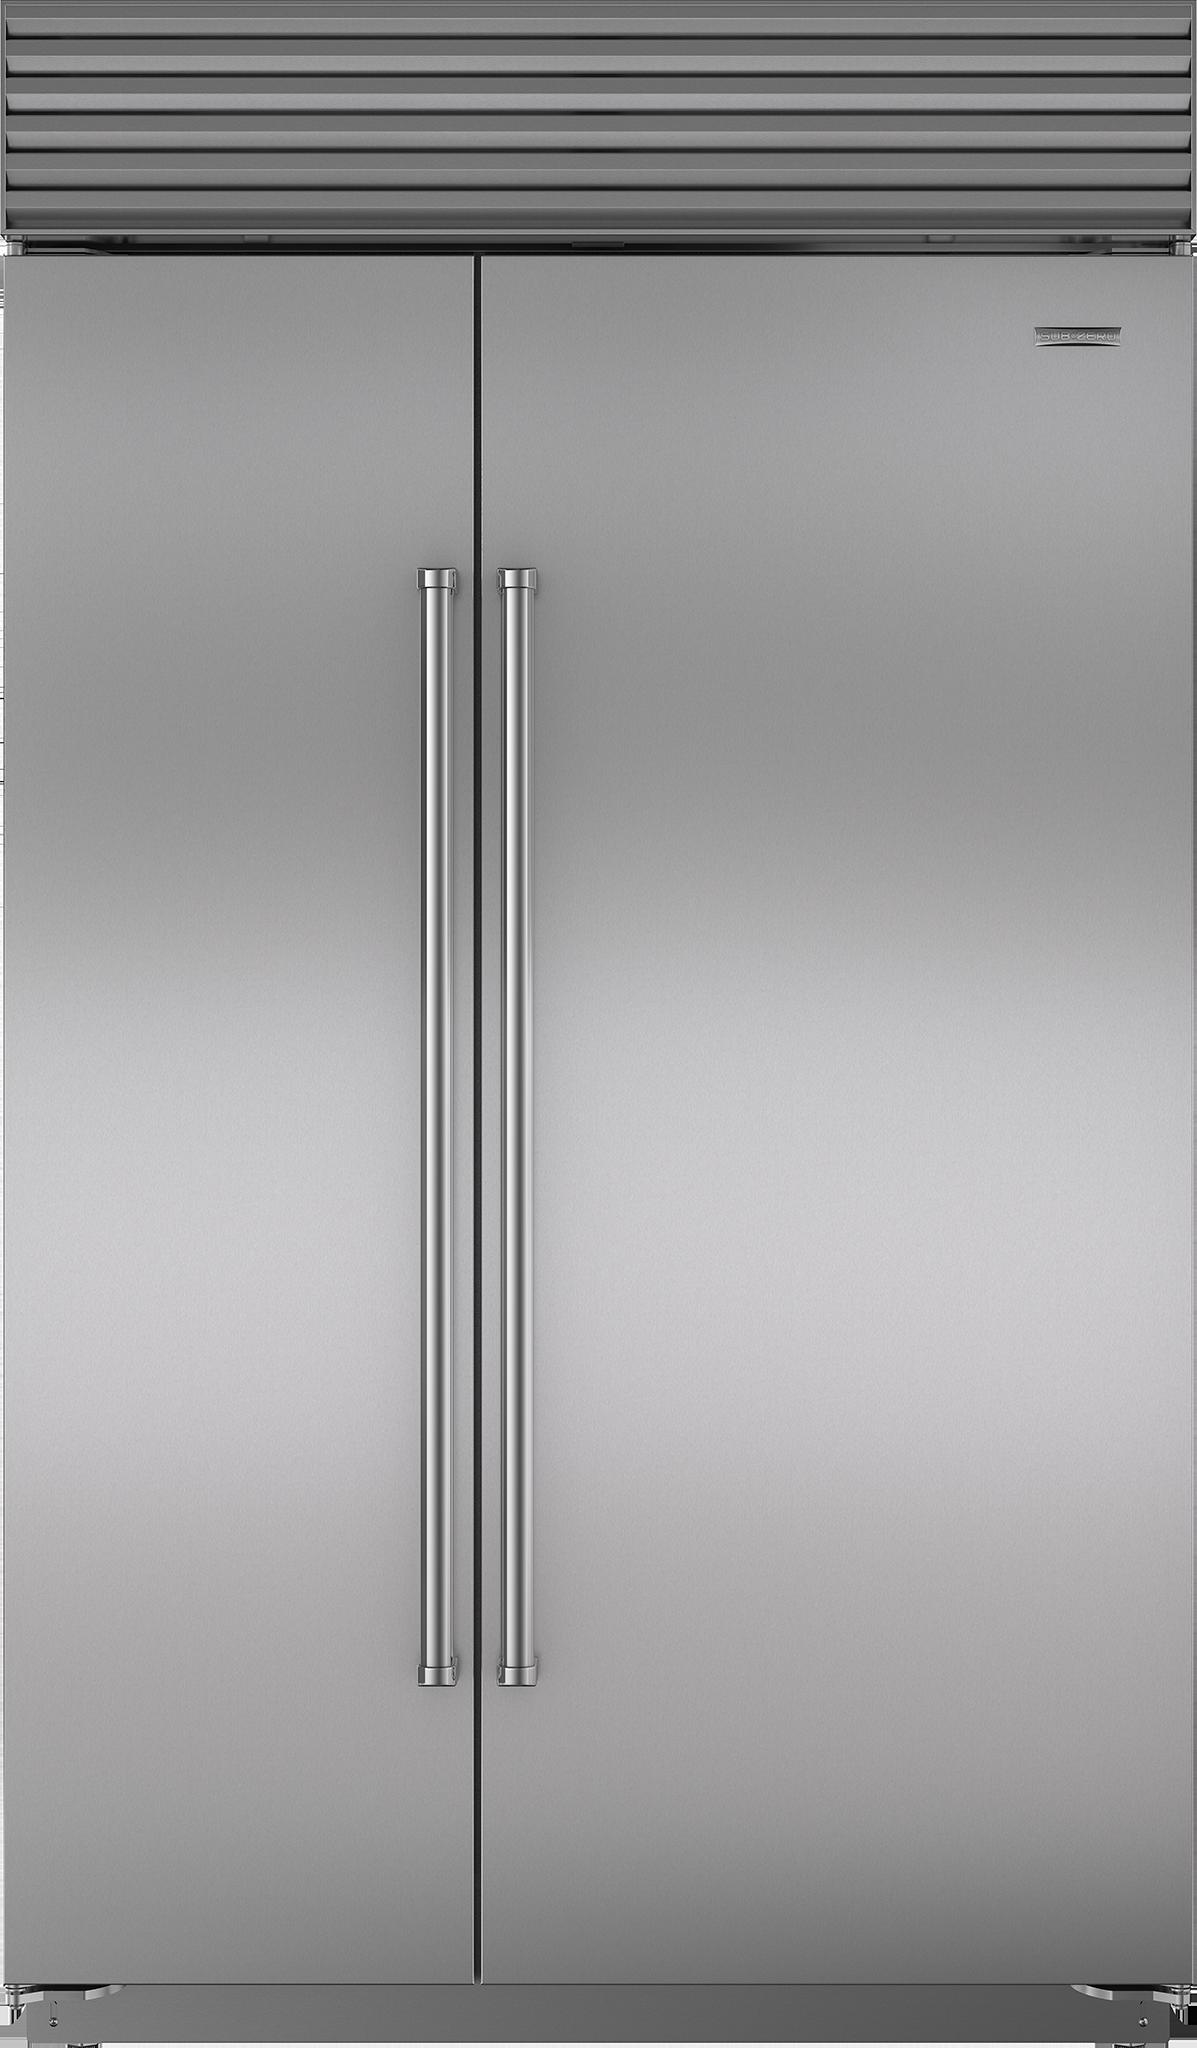 Sub Zero Bi 48sidsph 48 Built In Side By Side Refrigerator